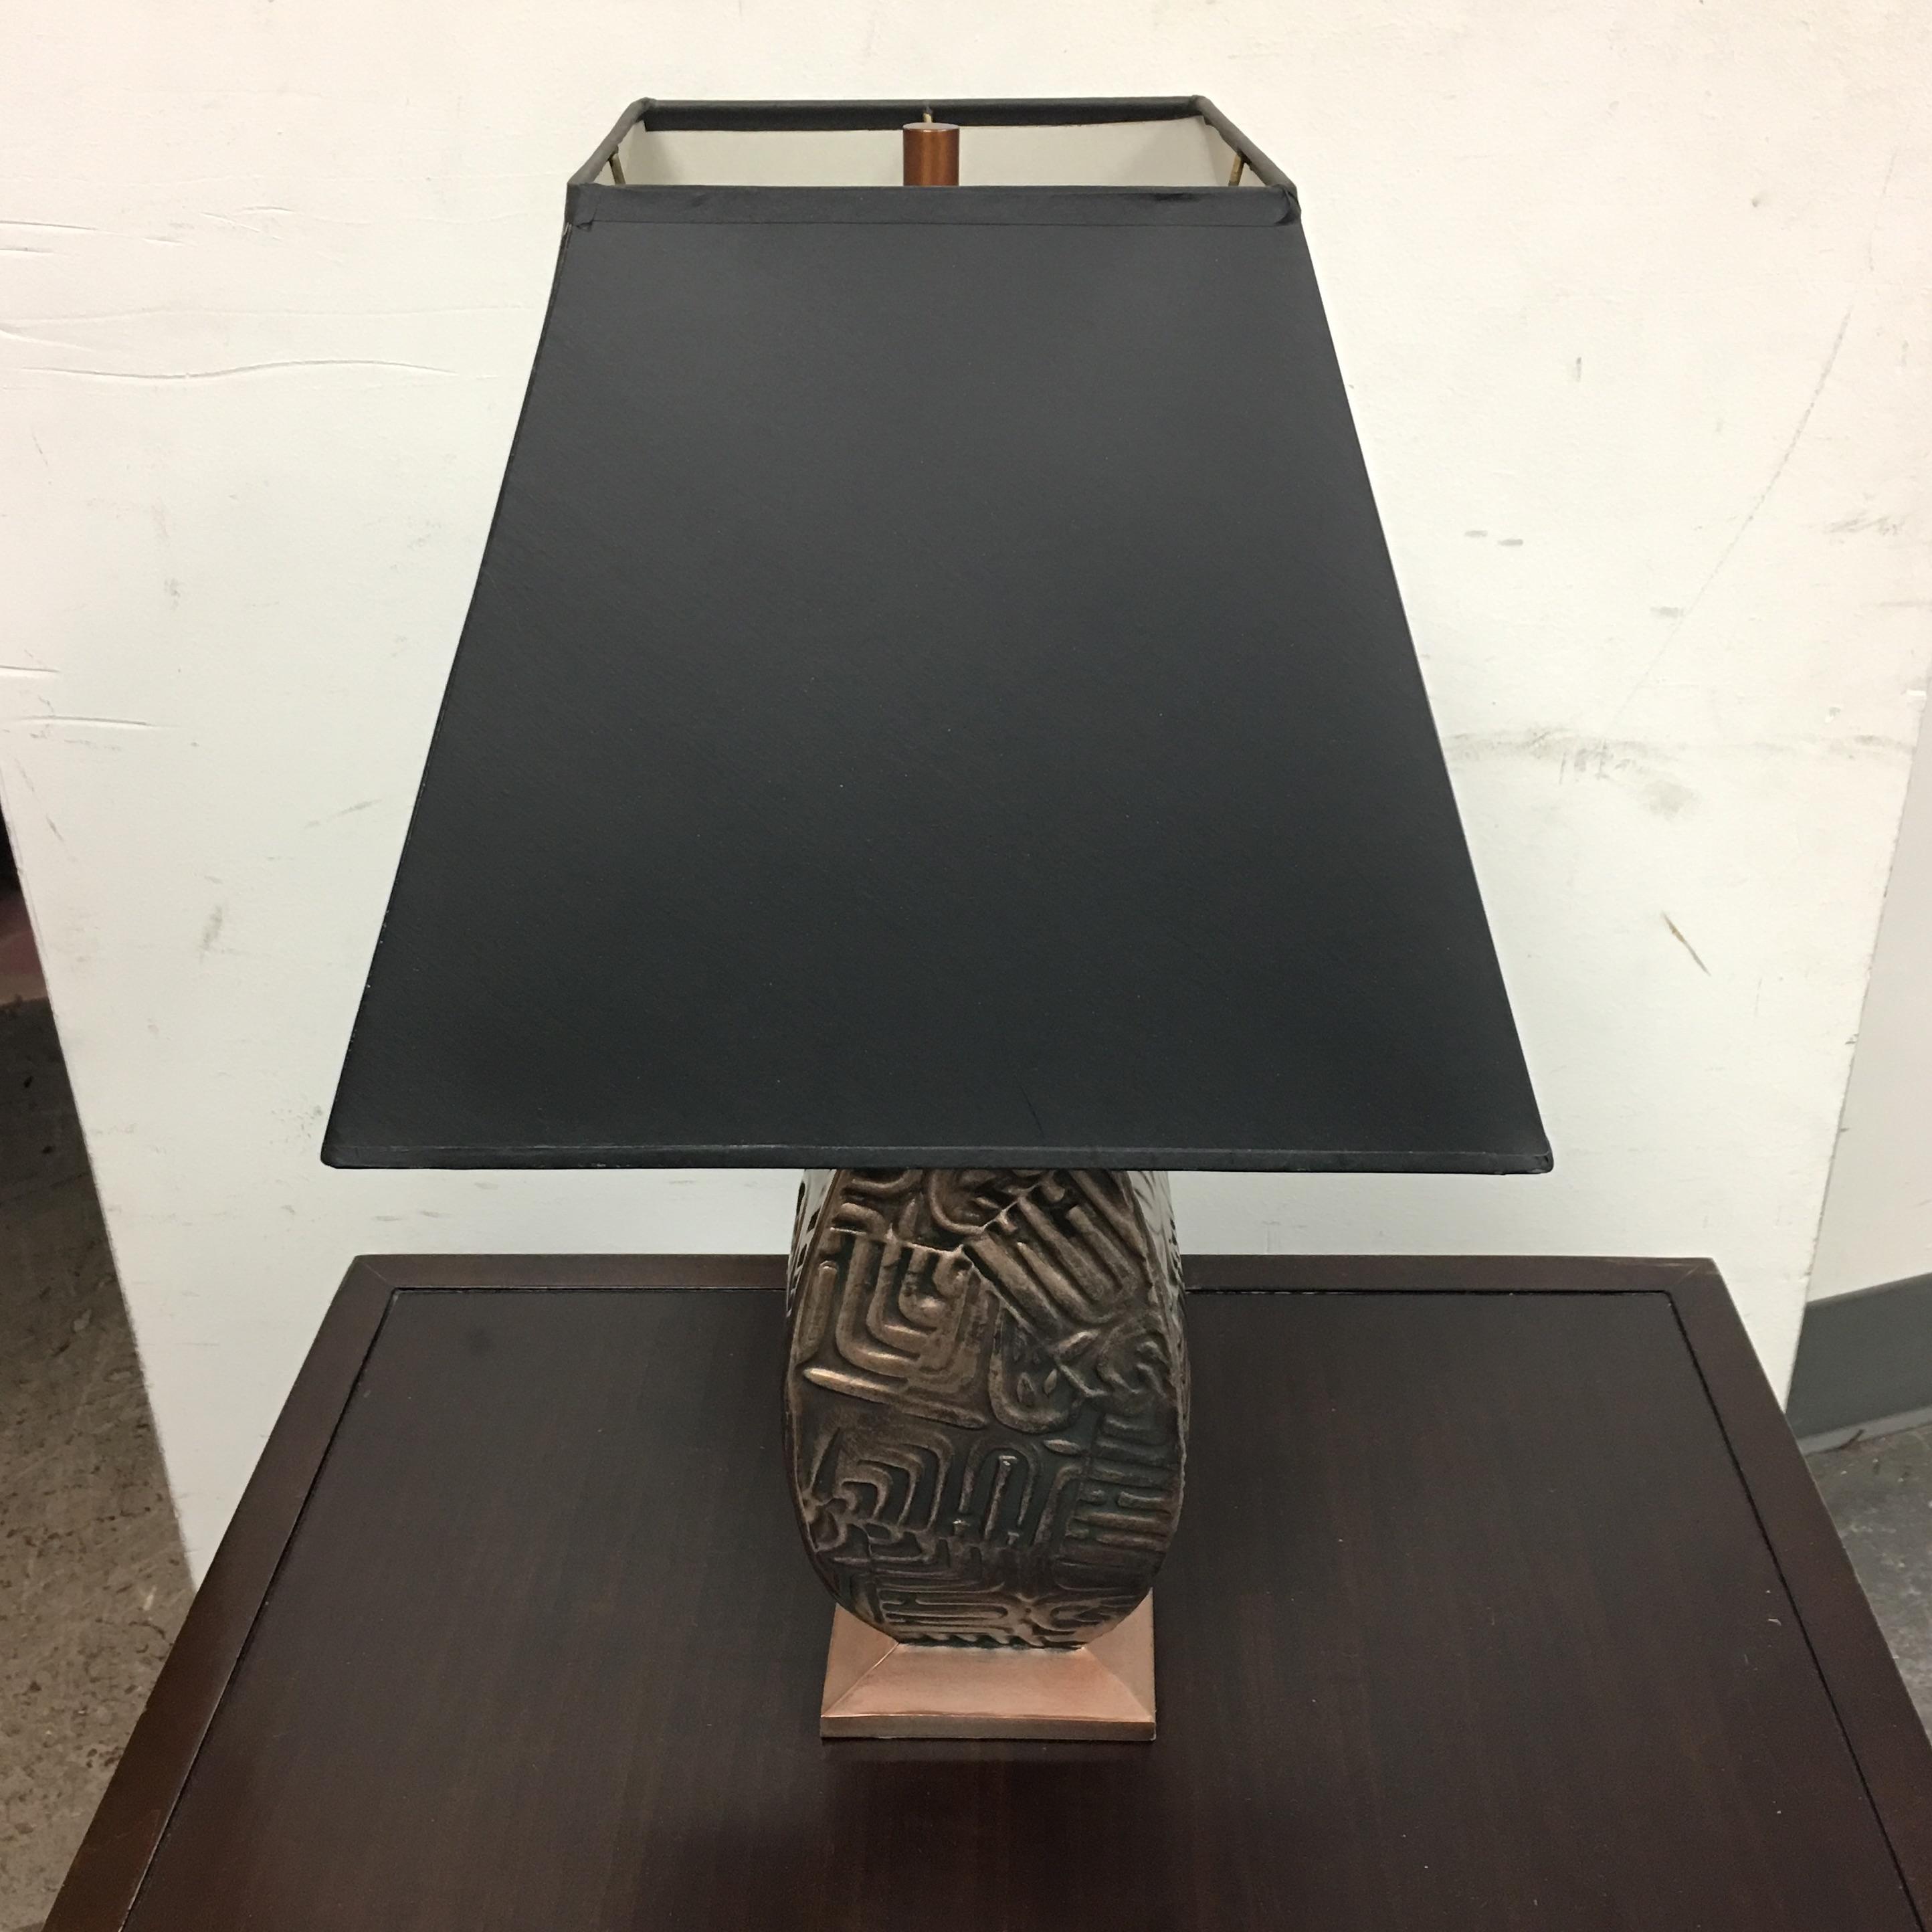 Gumps metal base table lamp image 3